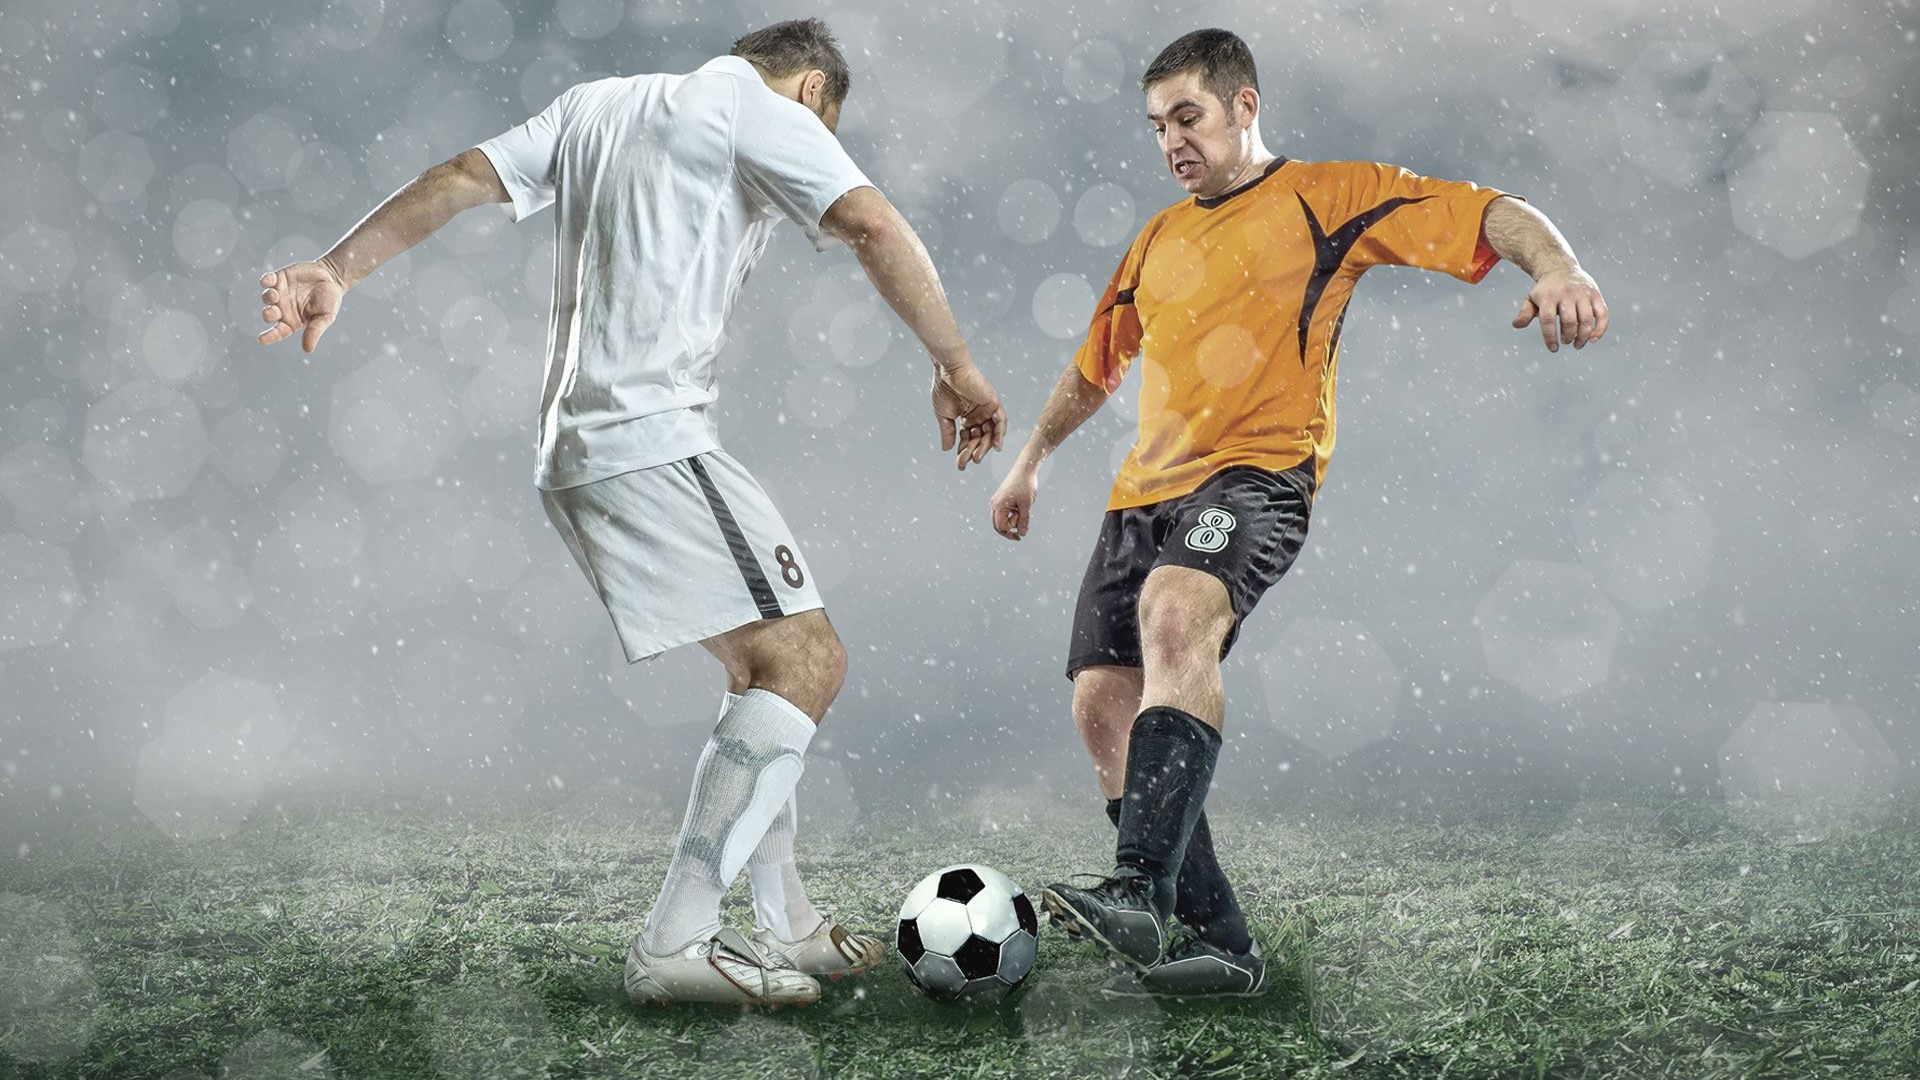 live-uruguay-vs-chile-rugby-stream